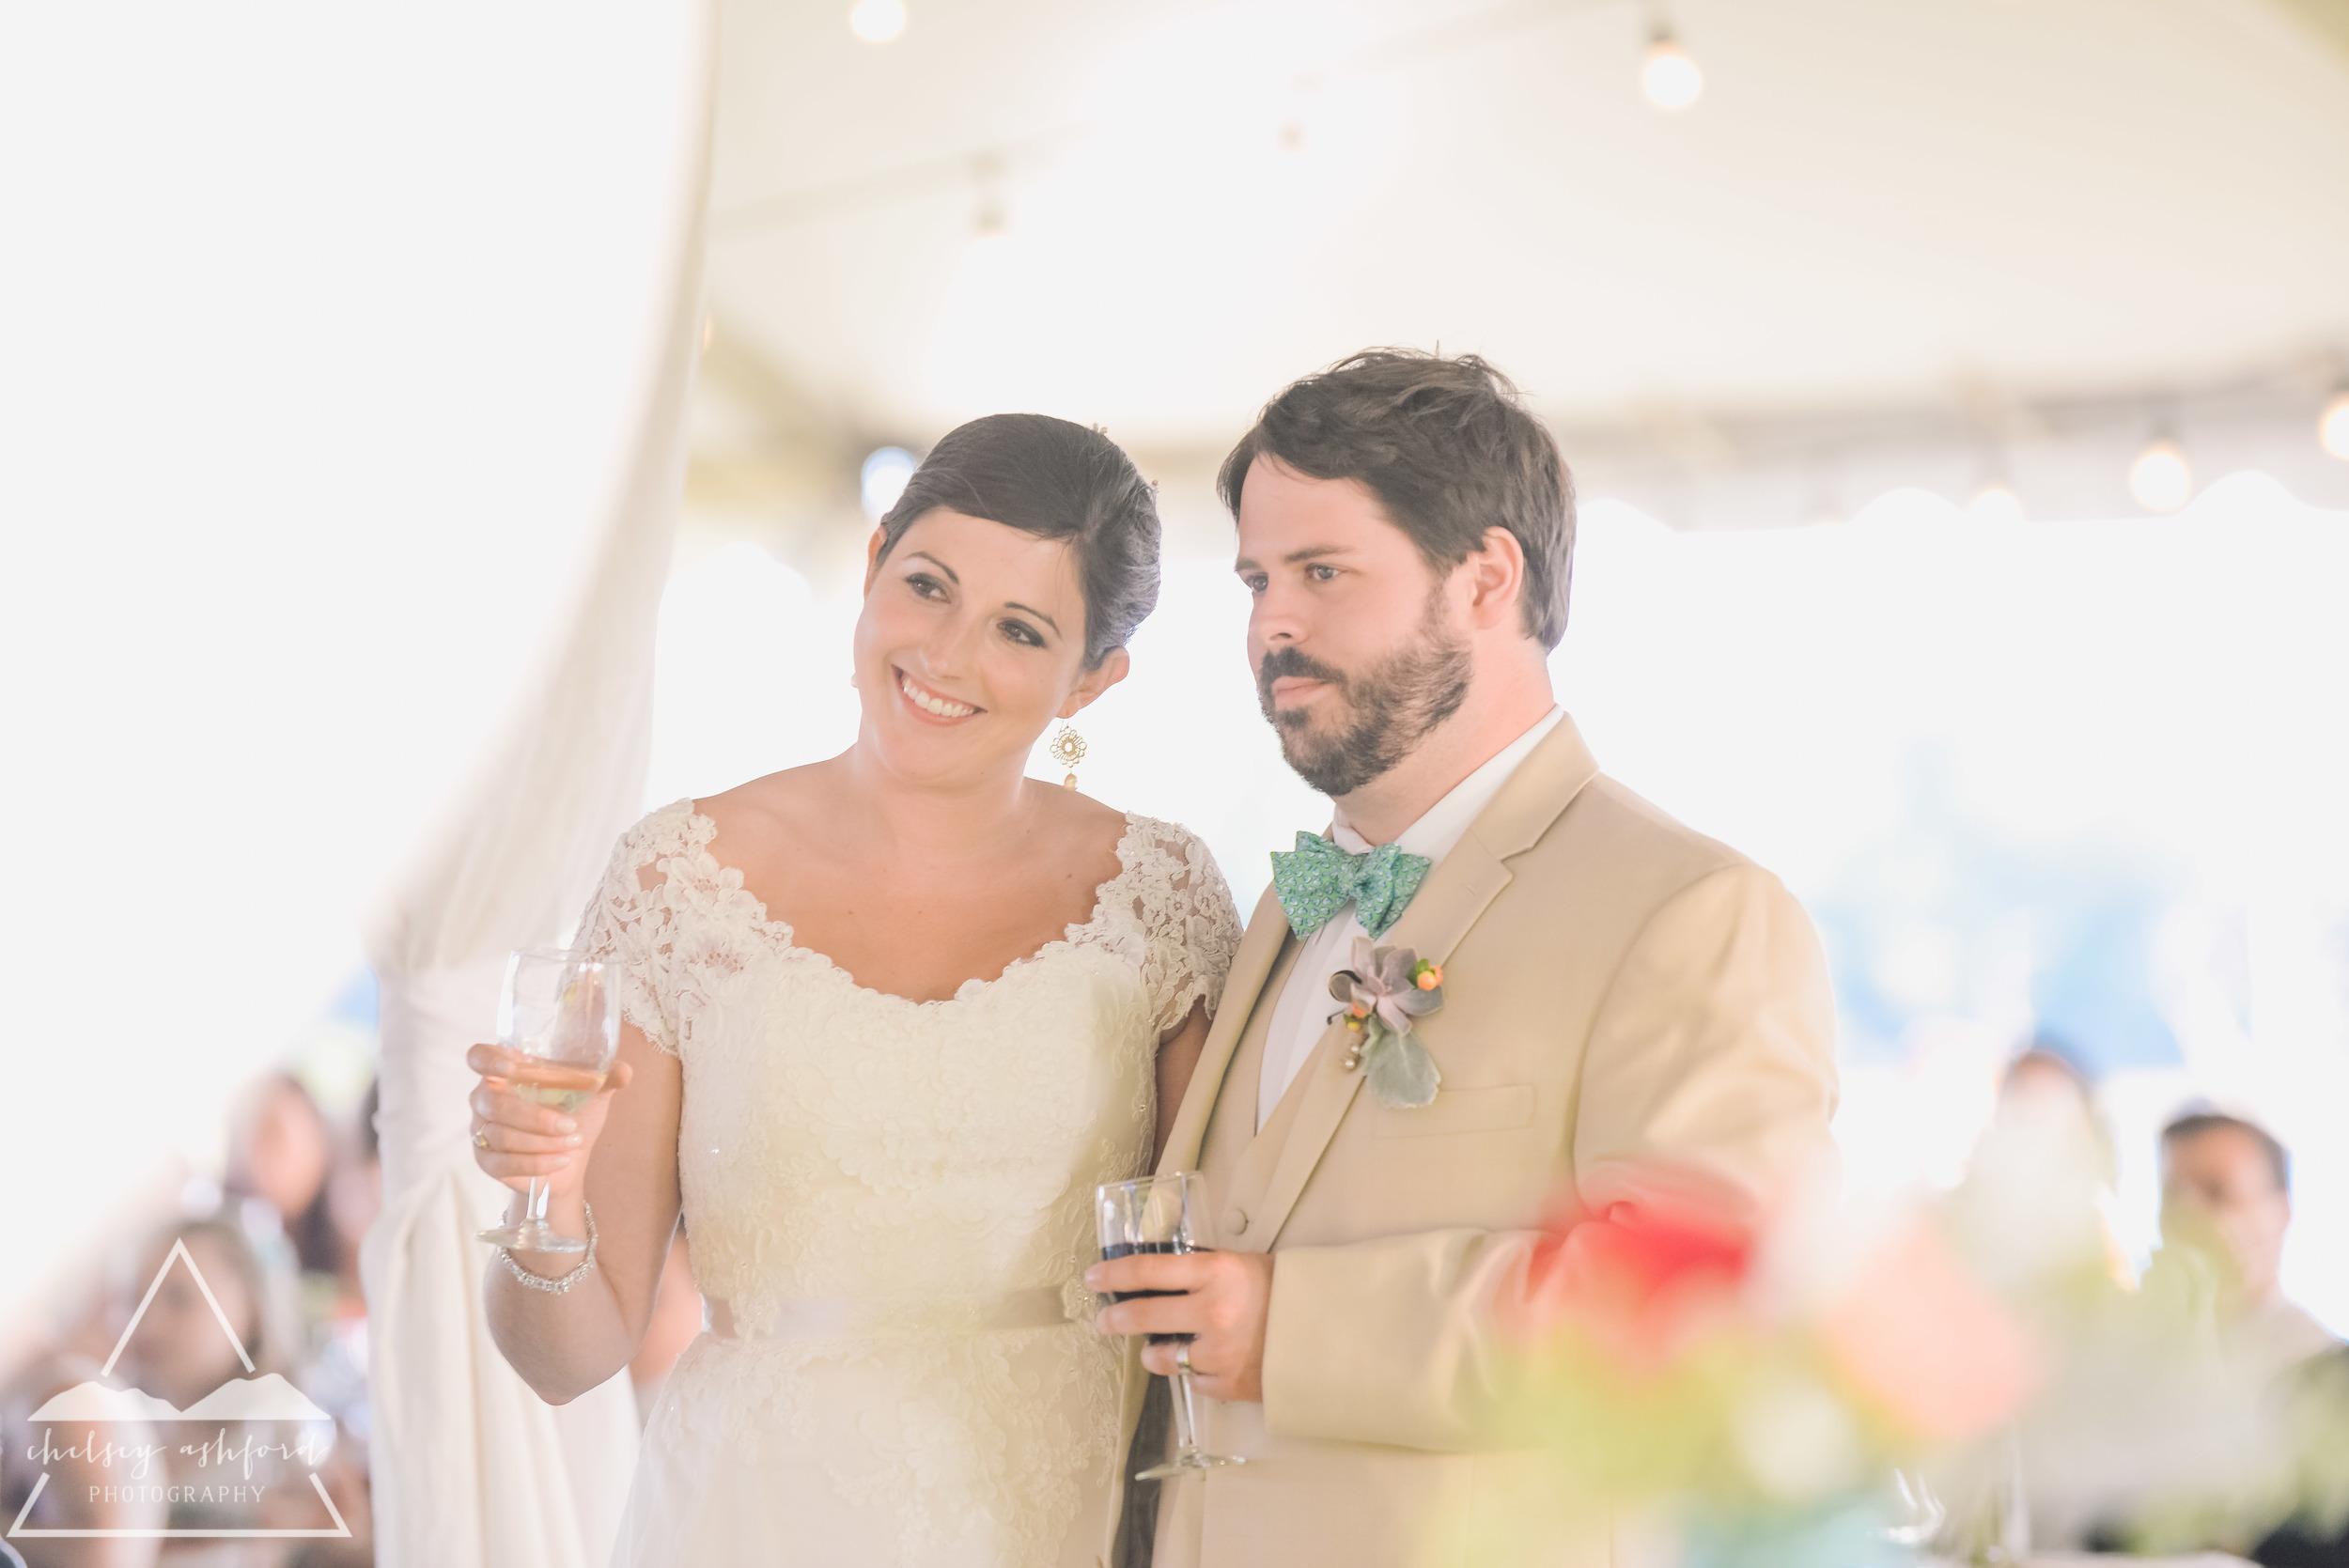 Clarkson_wedding_web-133.jpg